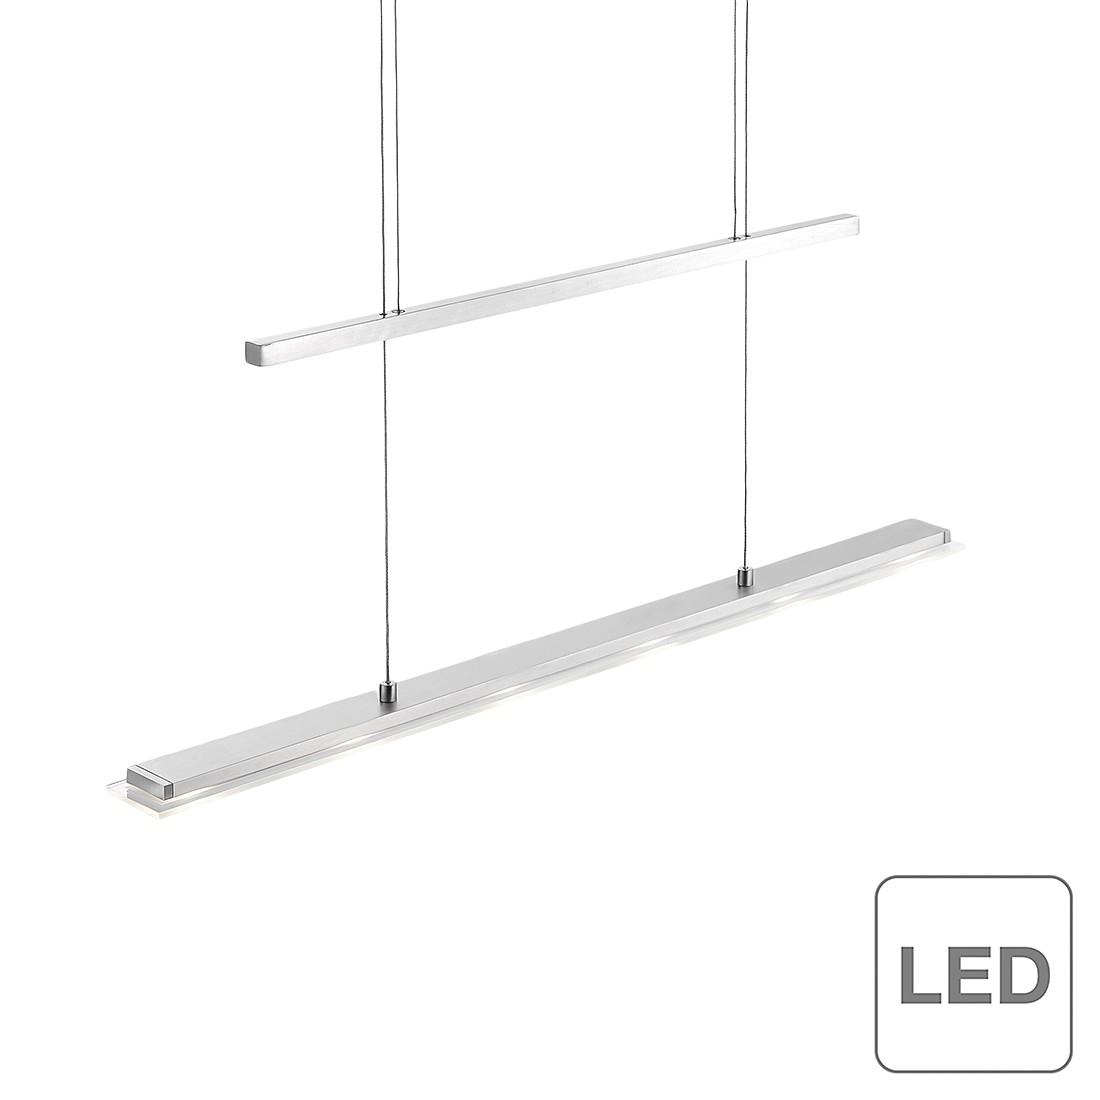 EEK A+, LED-Pendelleuchte Rack 2.0 - Metall/Glas - Silber, Paul Neuhaus